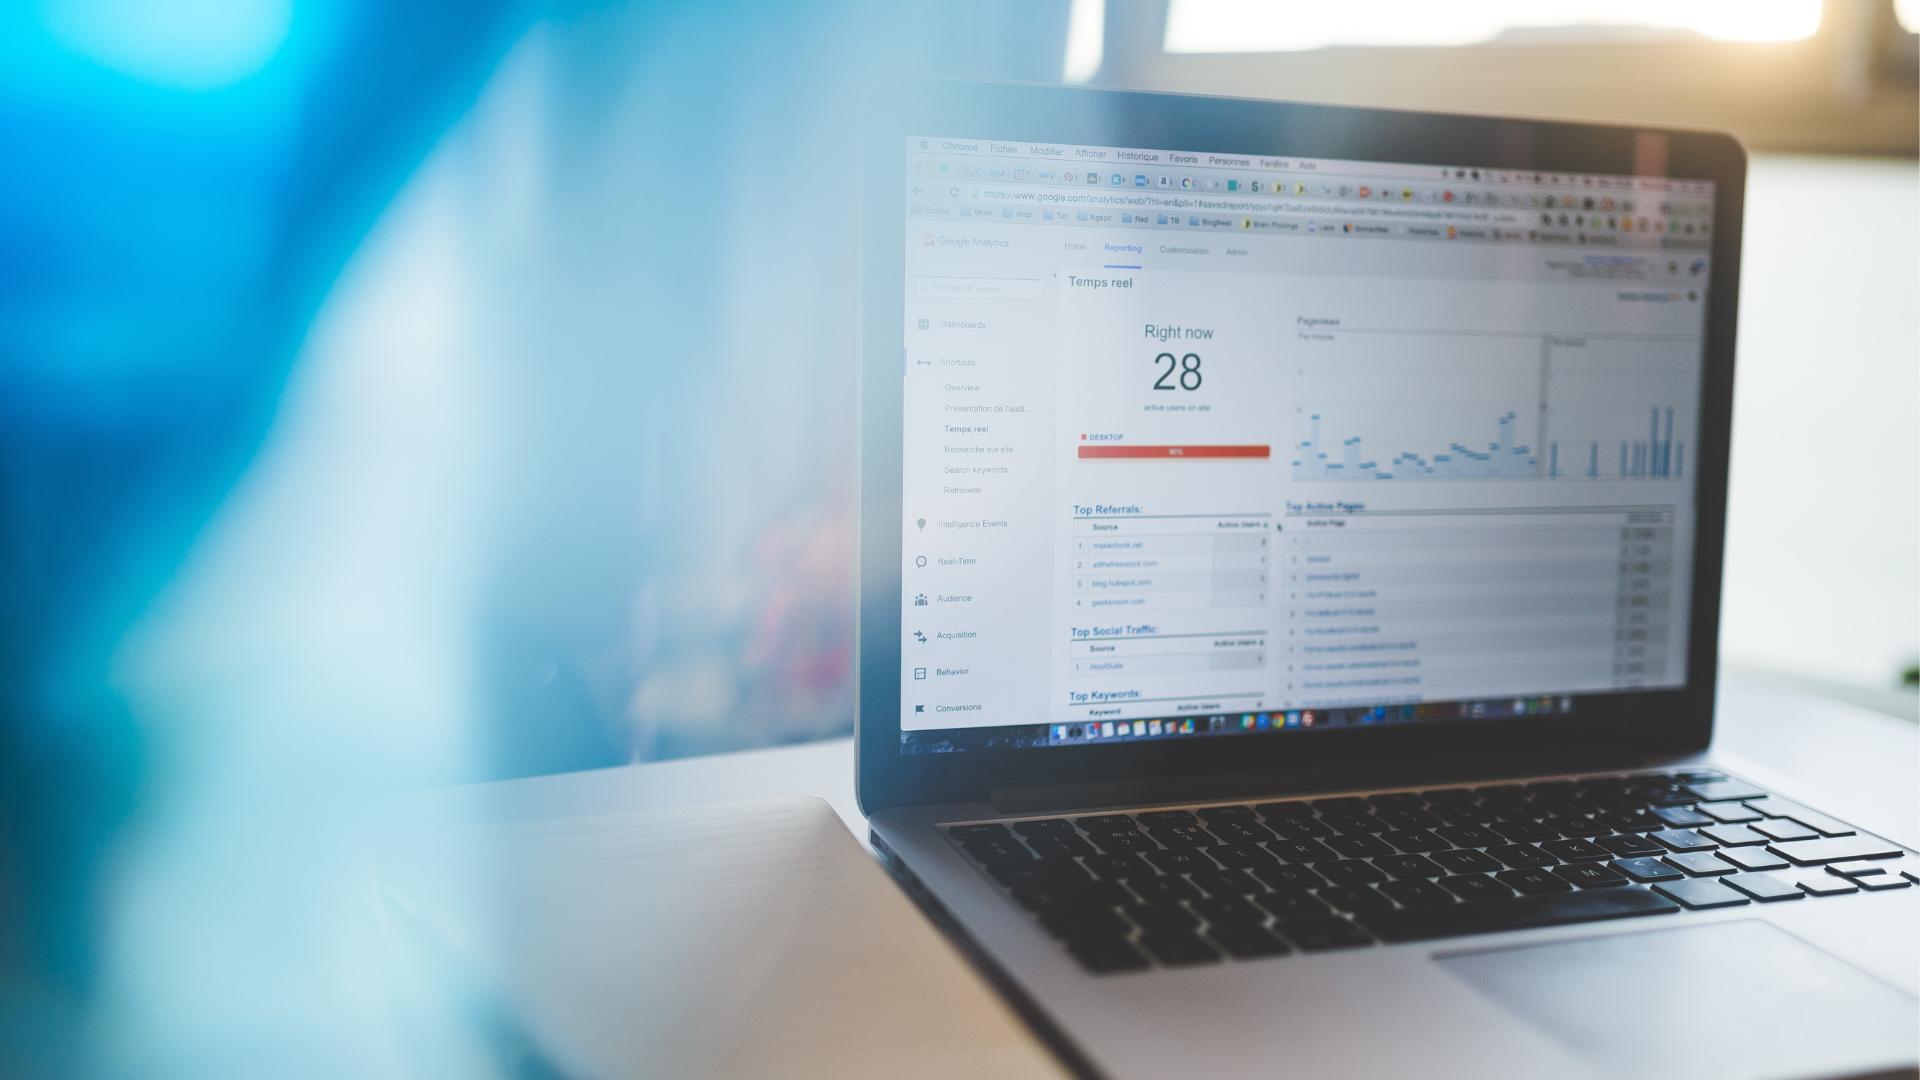 social media analytics metrics on screen